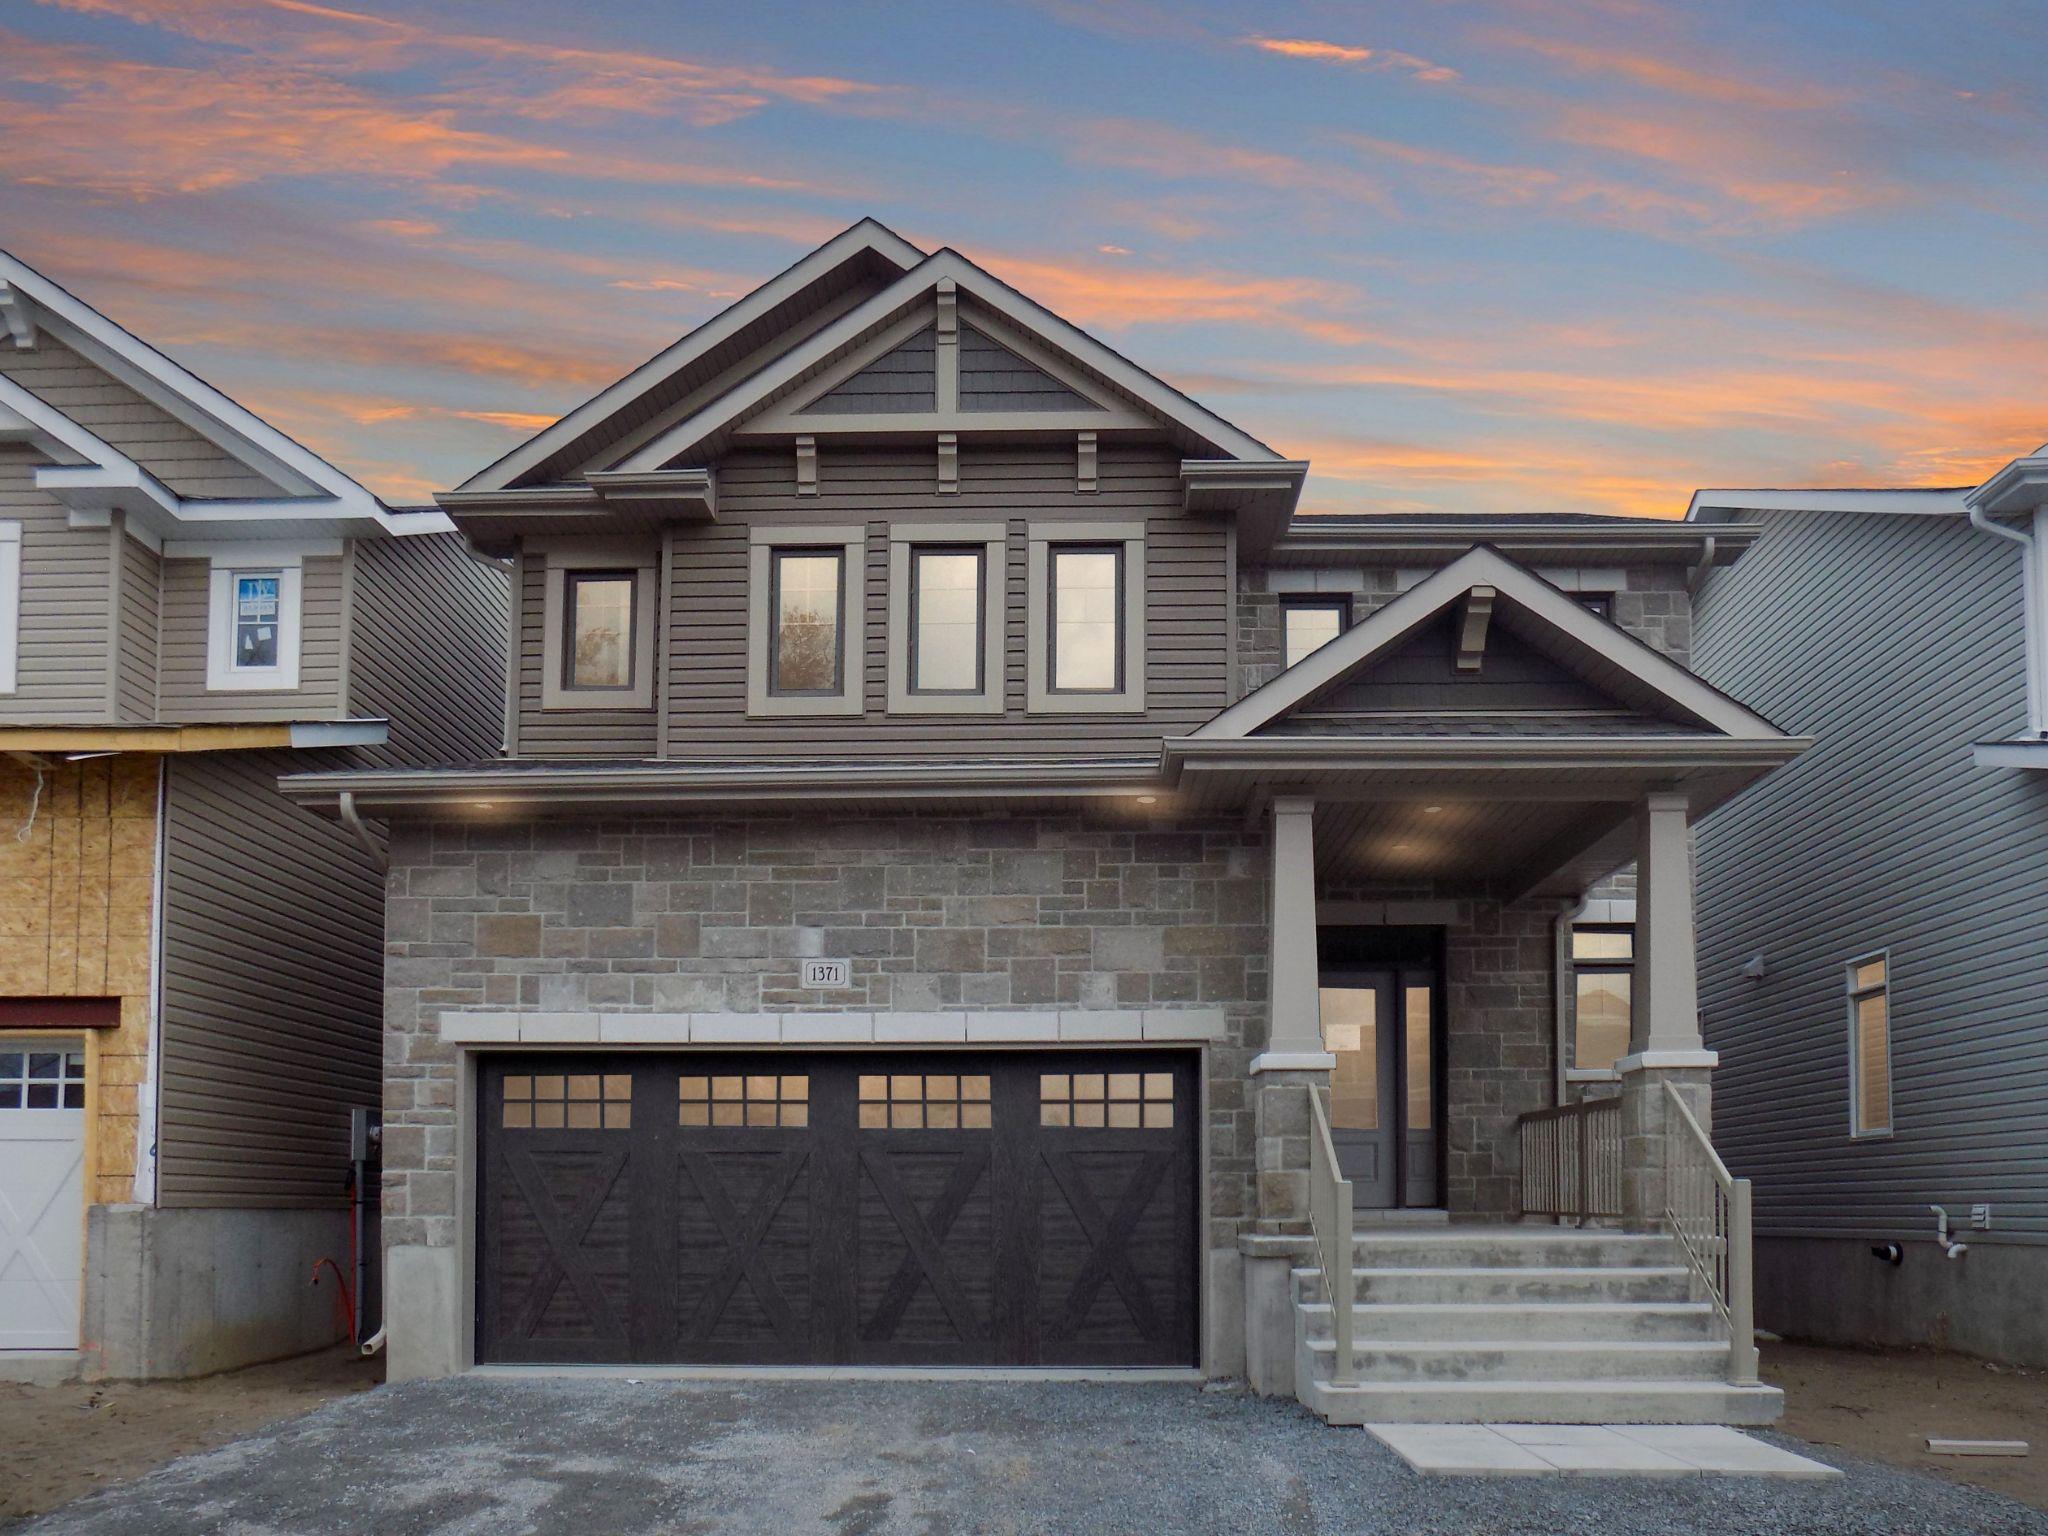 Main Photo: 1371 ANDERSEN Drive in Kingston: House for sale (42 - City Northwest)  : MLS®# K21001248